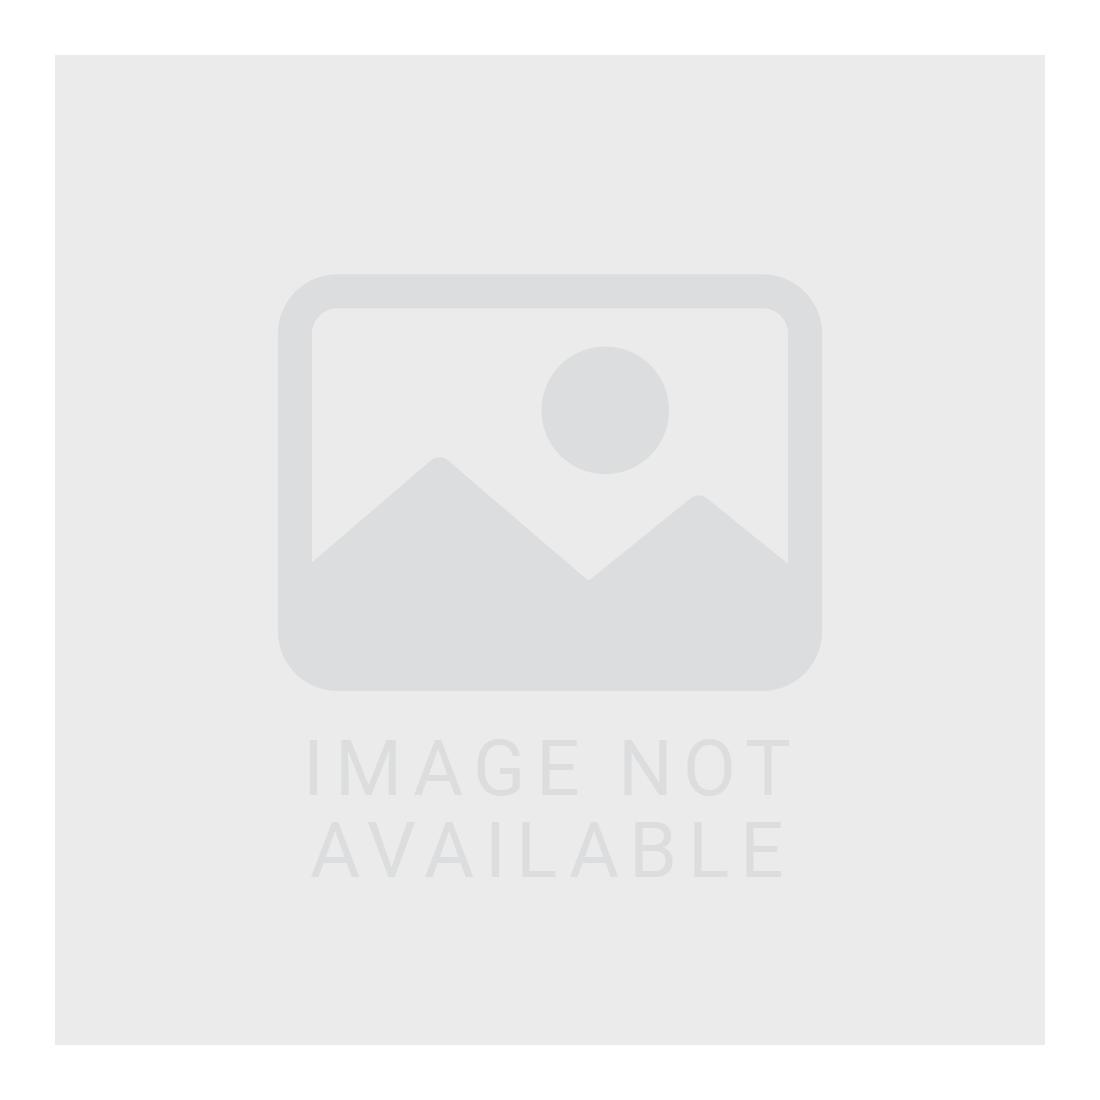 1:24 1970 Challenger Convertible